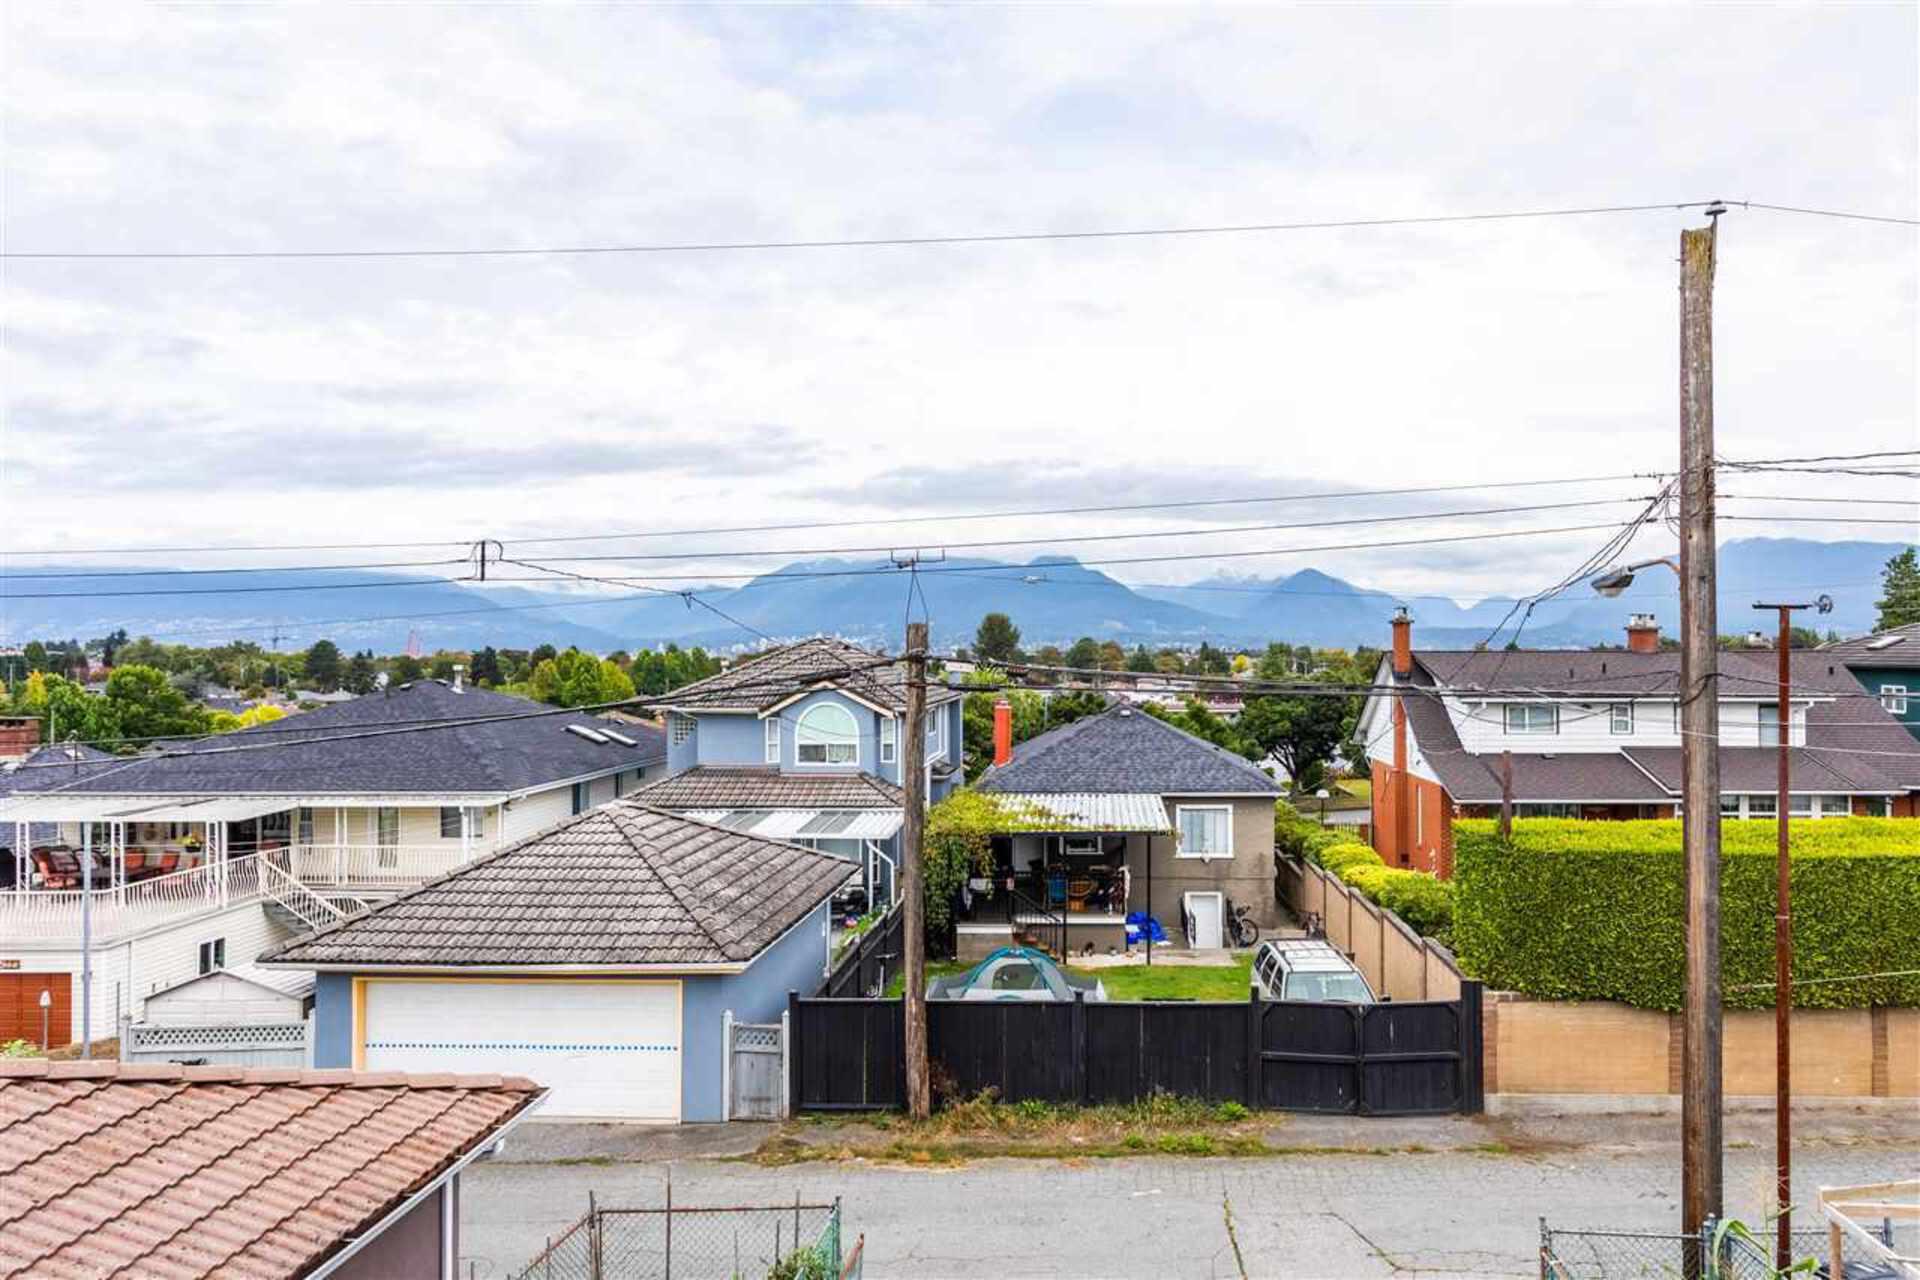 2675-e-5th-avenue-renfrew-ve-vancouver-east-34 at 2675 E 5th Avenue, Renfrew VE, Vancouver East